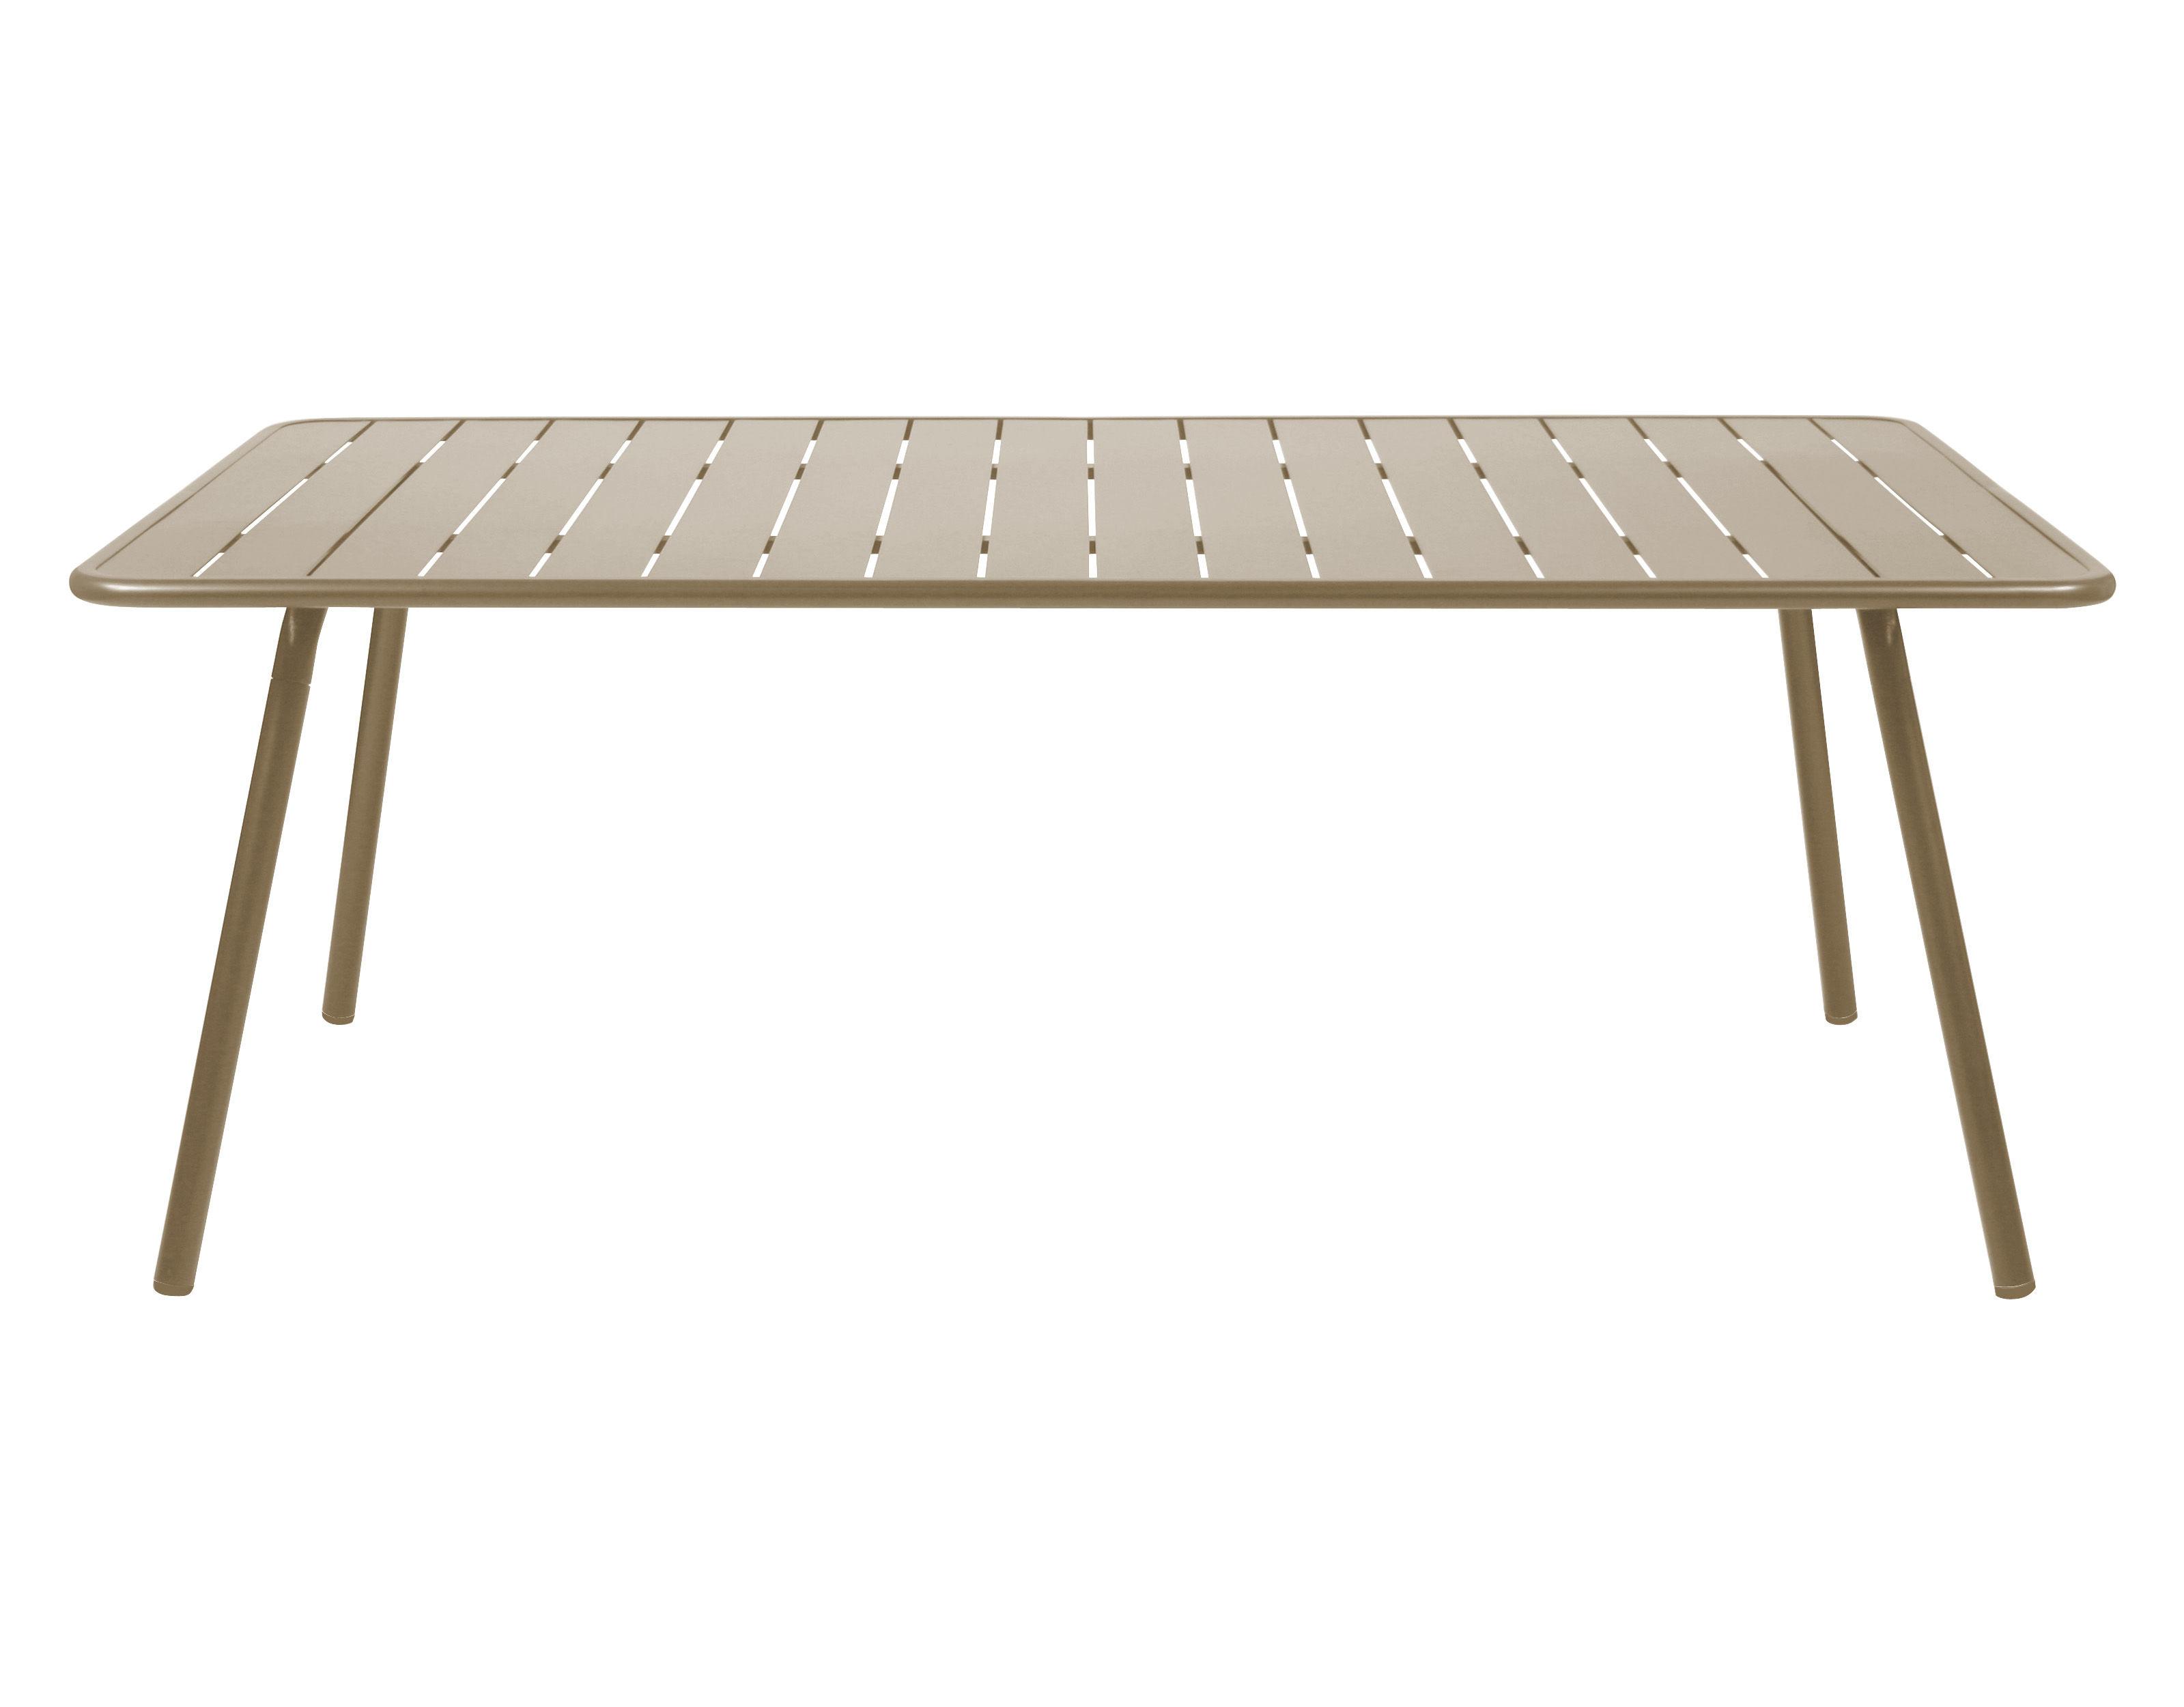 Jardin - Tables de jardin - Table Luxembourg / 8 personnes - 207 x 100 cm - Aluminium - Fermob - Muscade - Aluminium laqué